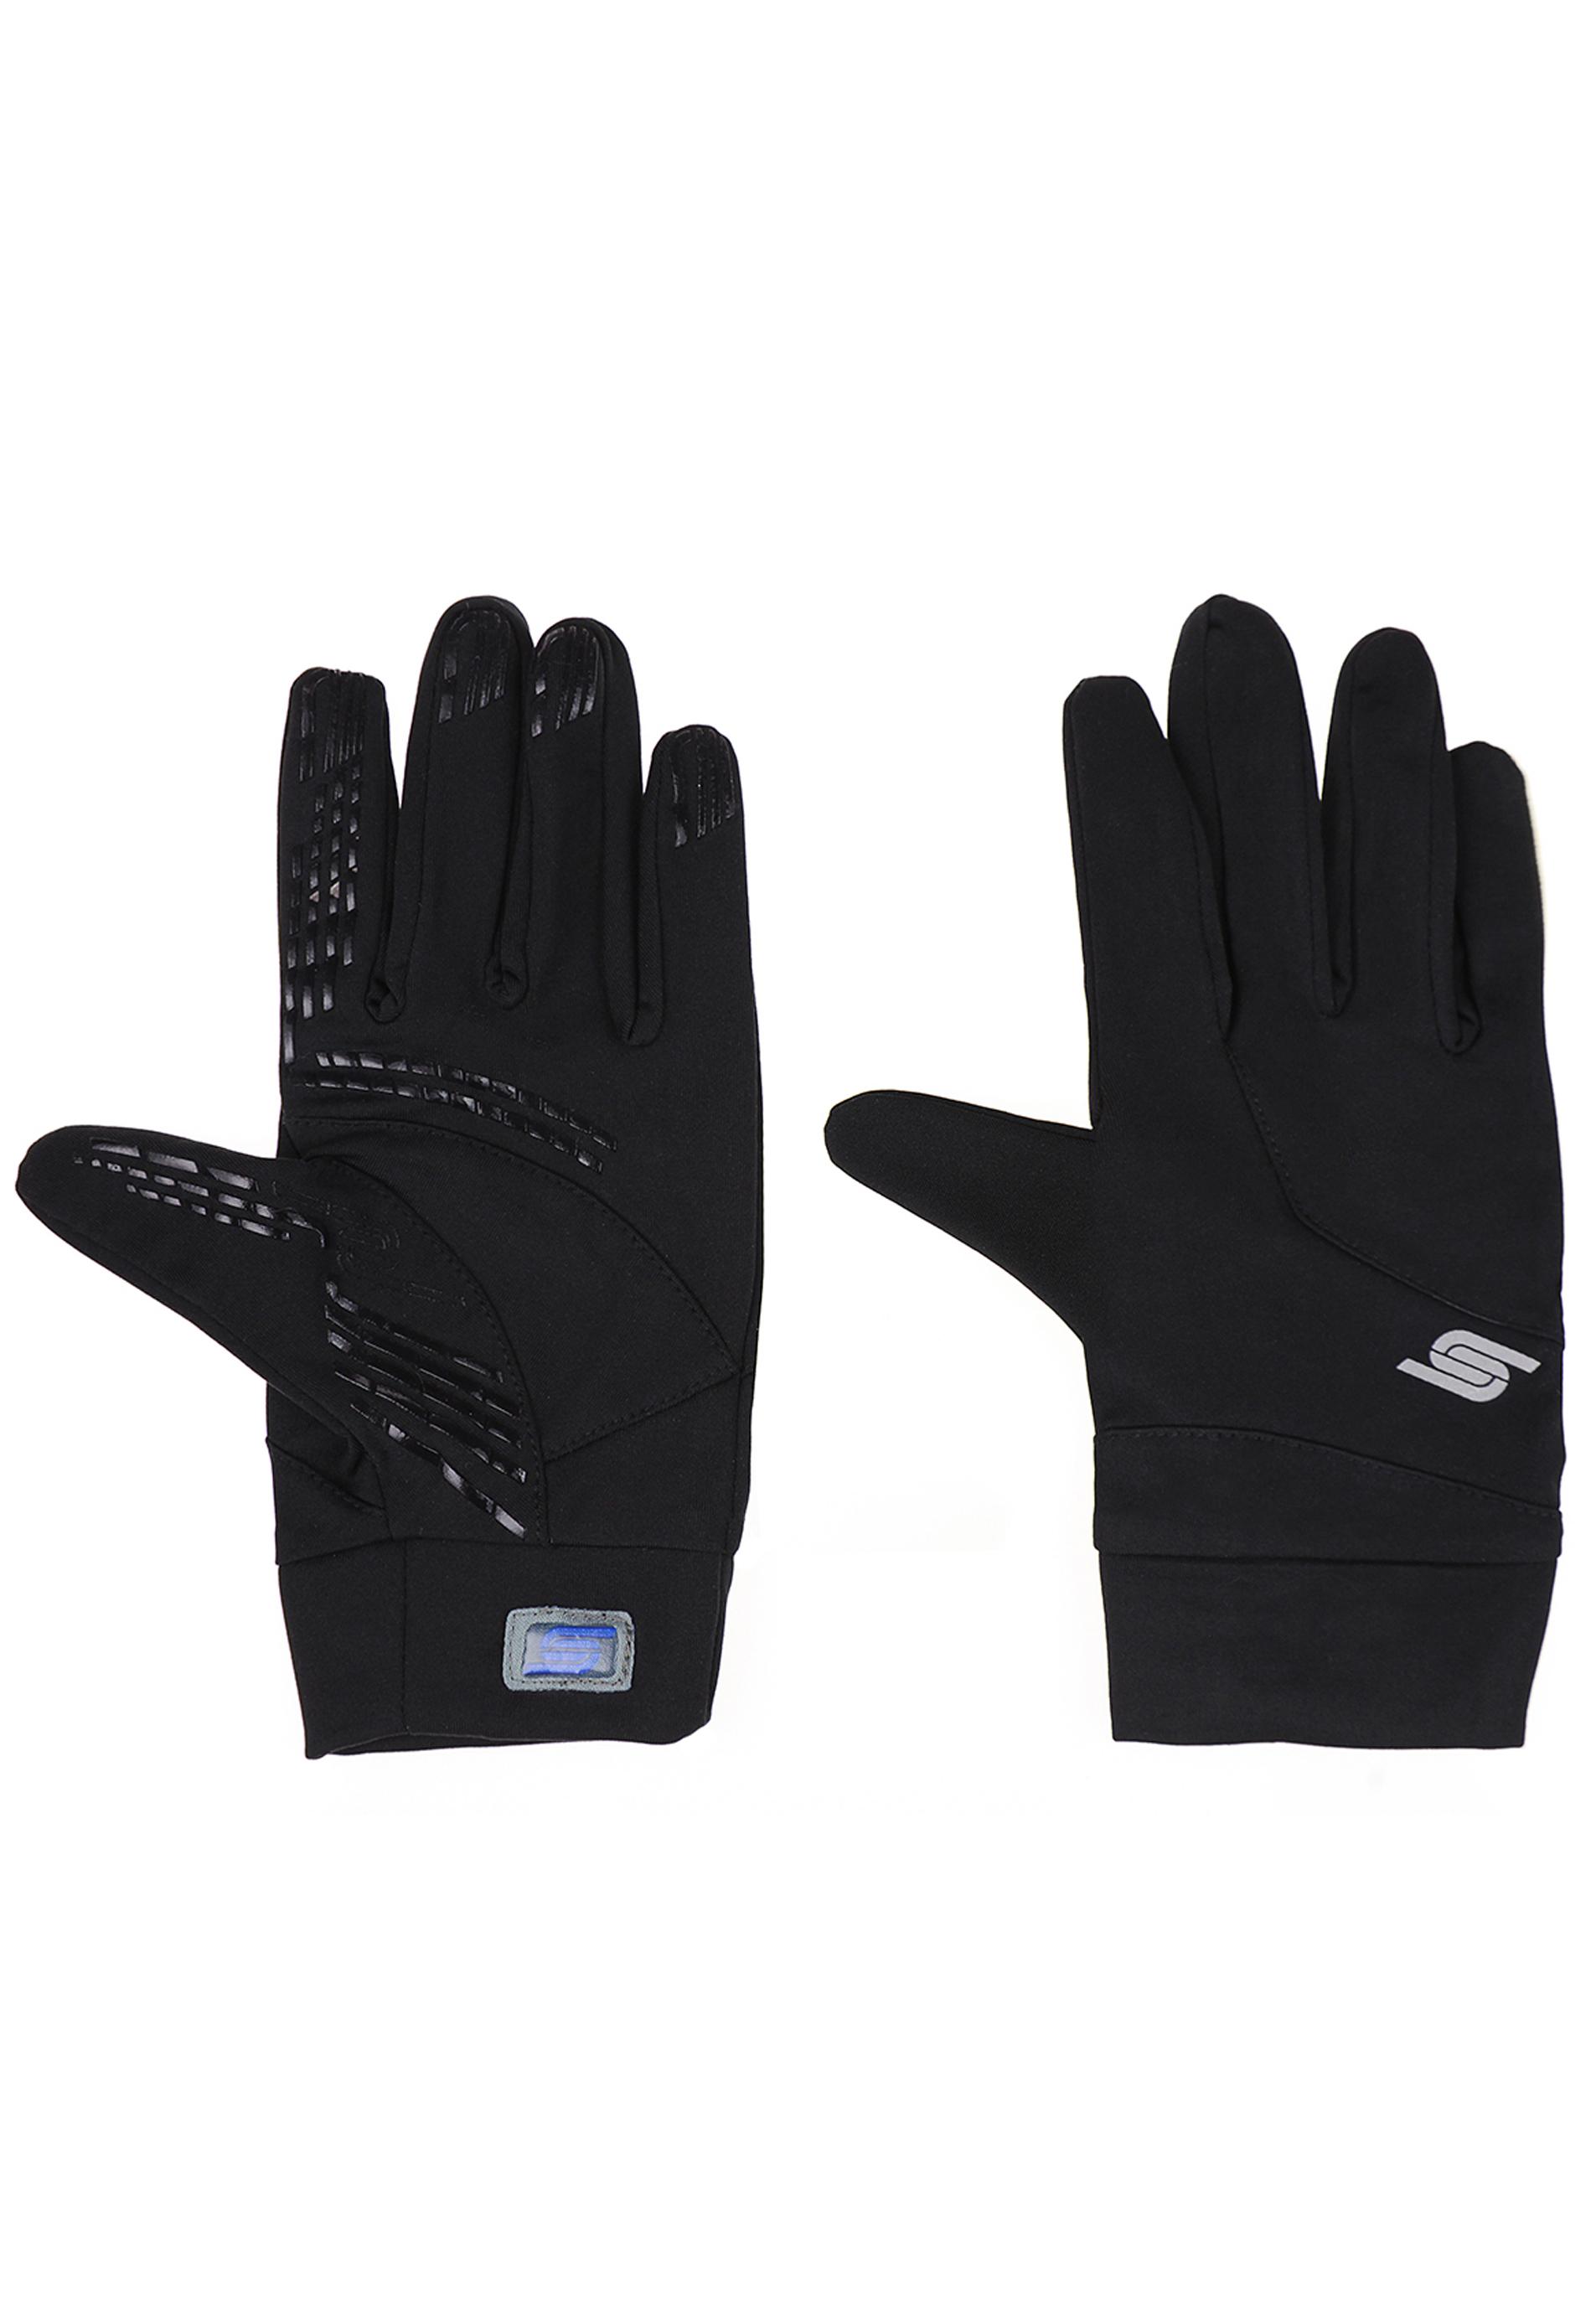 Soccer Fielder Glove with Grippers